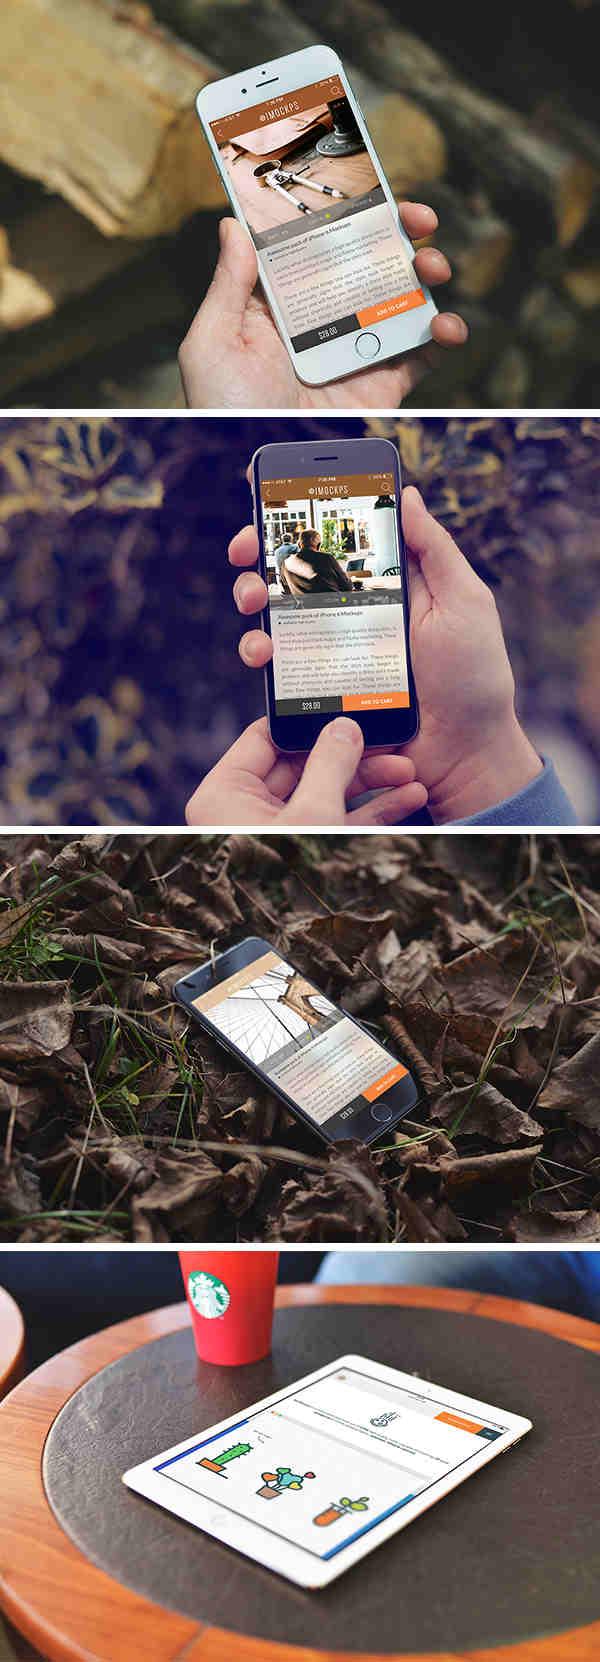 iPhone 6 & iPad Air 2 Photo Mockups